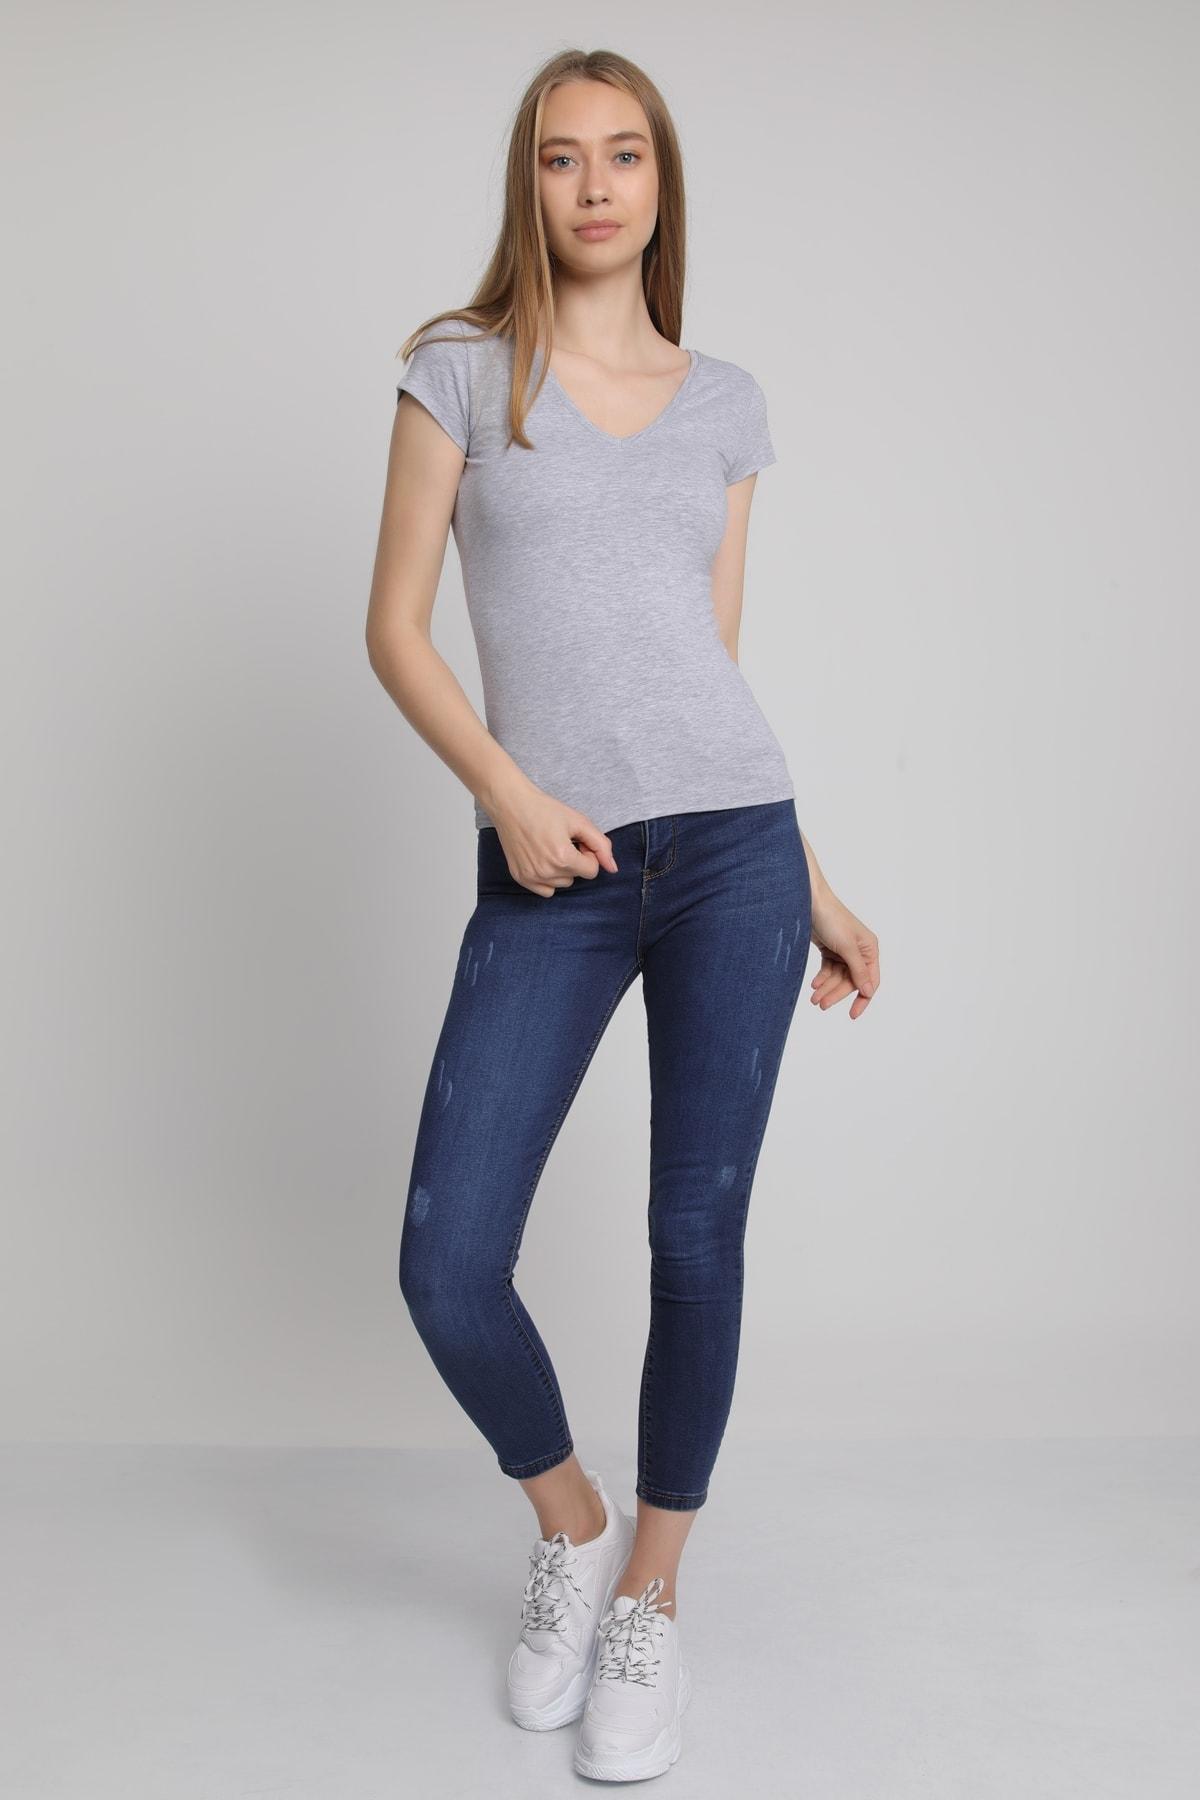 MD trend Kadın Gri Ön Arka V Yaka T-Shirt Mdt3472 1